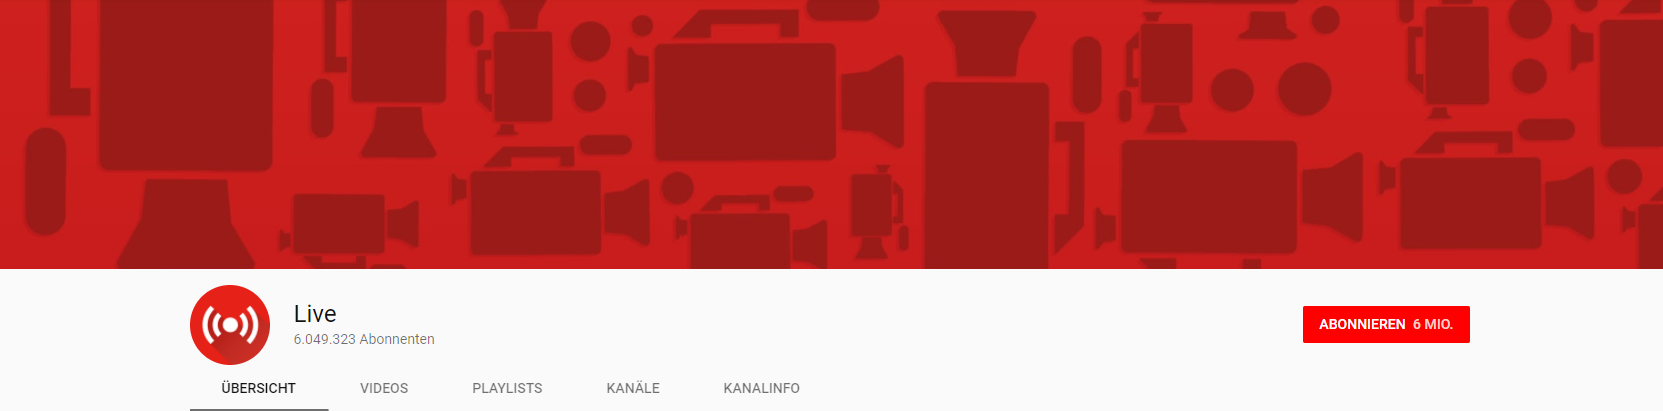 YouTube_Live